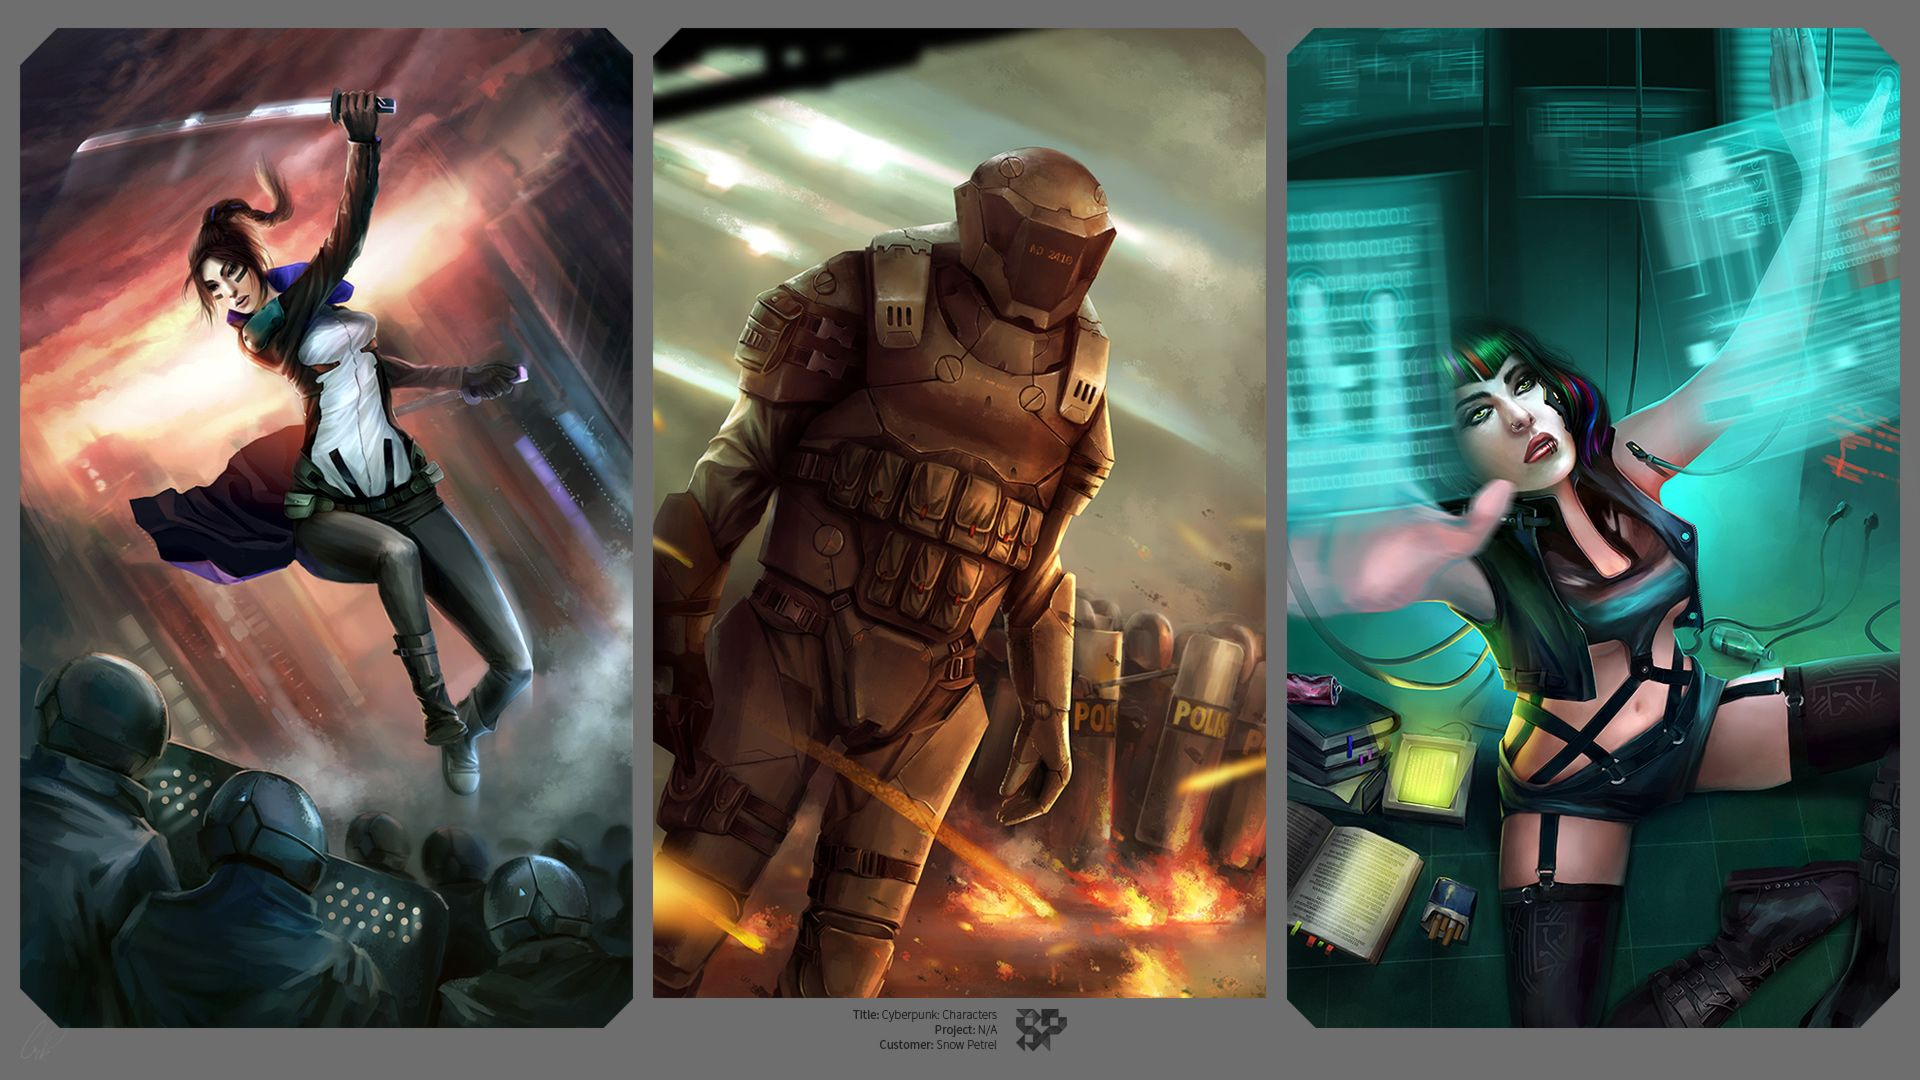 cyberpunk smoker - Buscar con Google | scifi characters | Pinterest